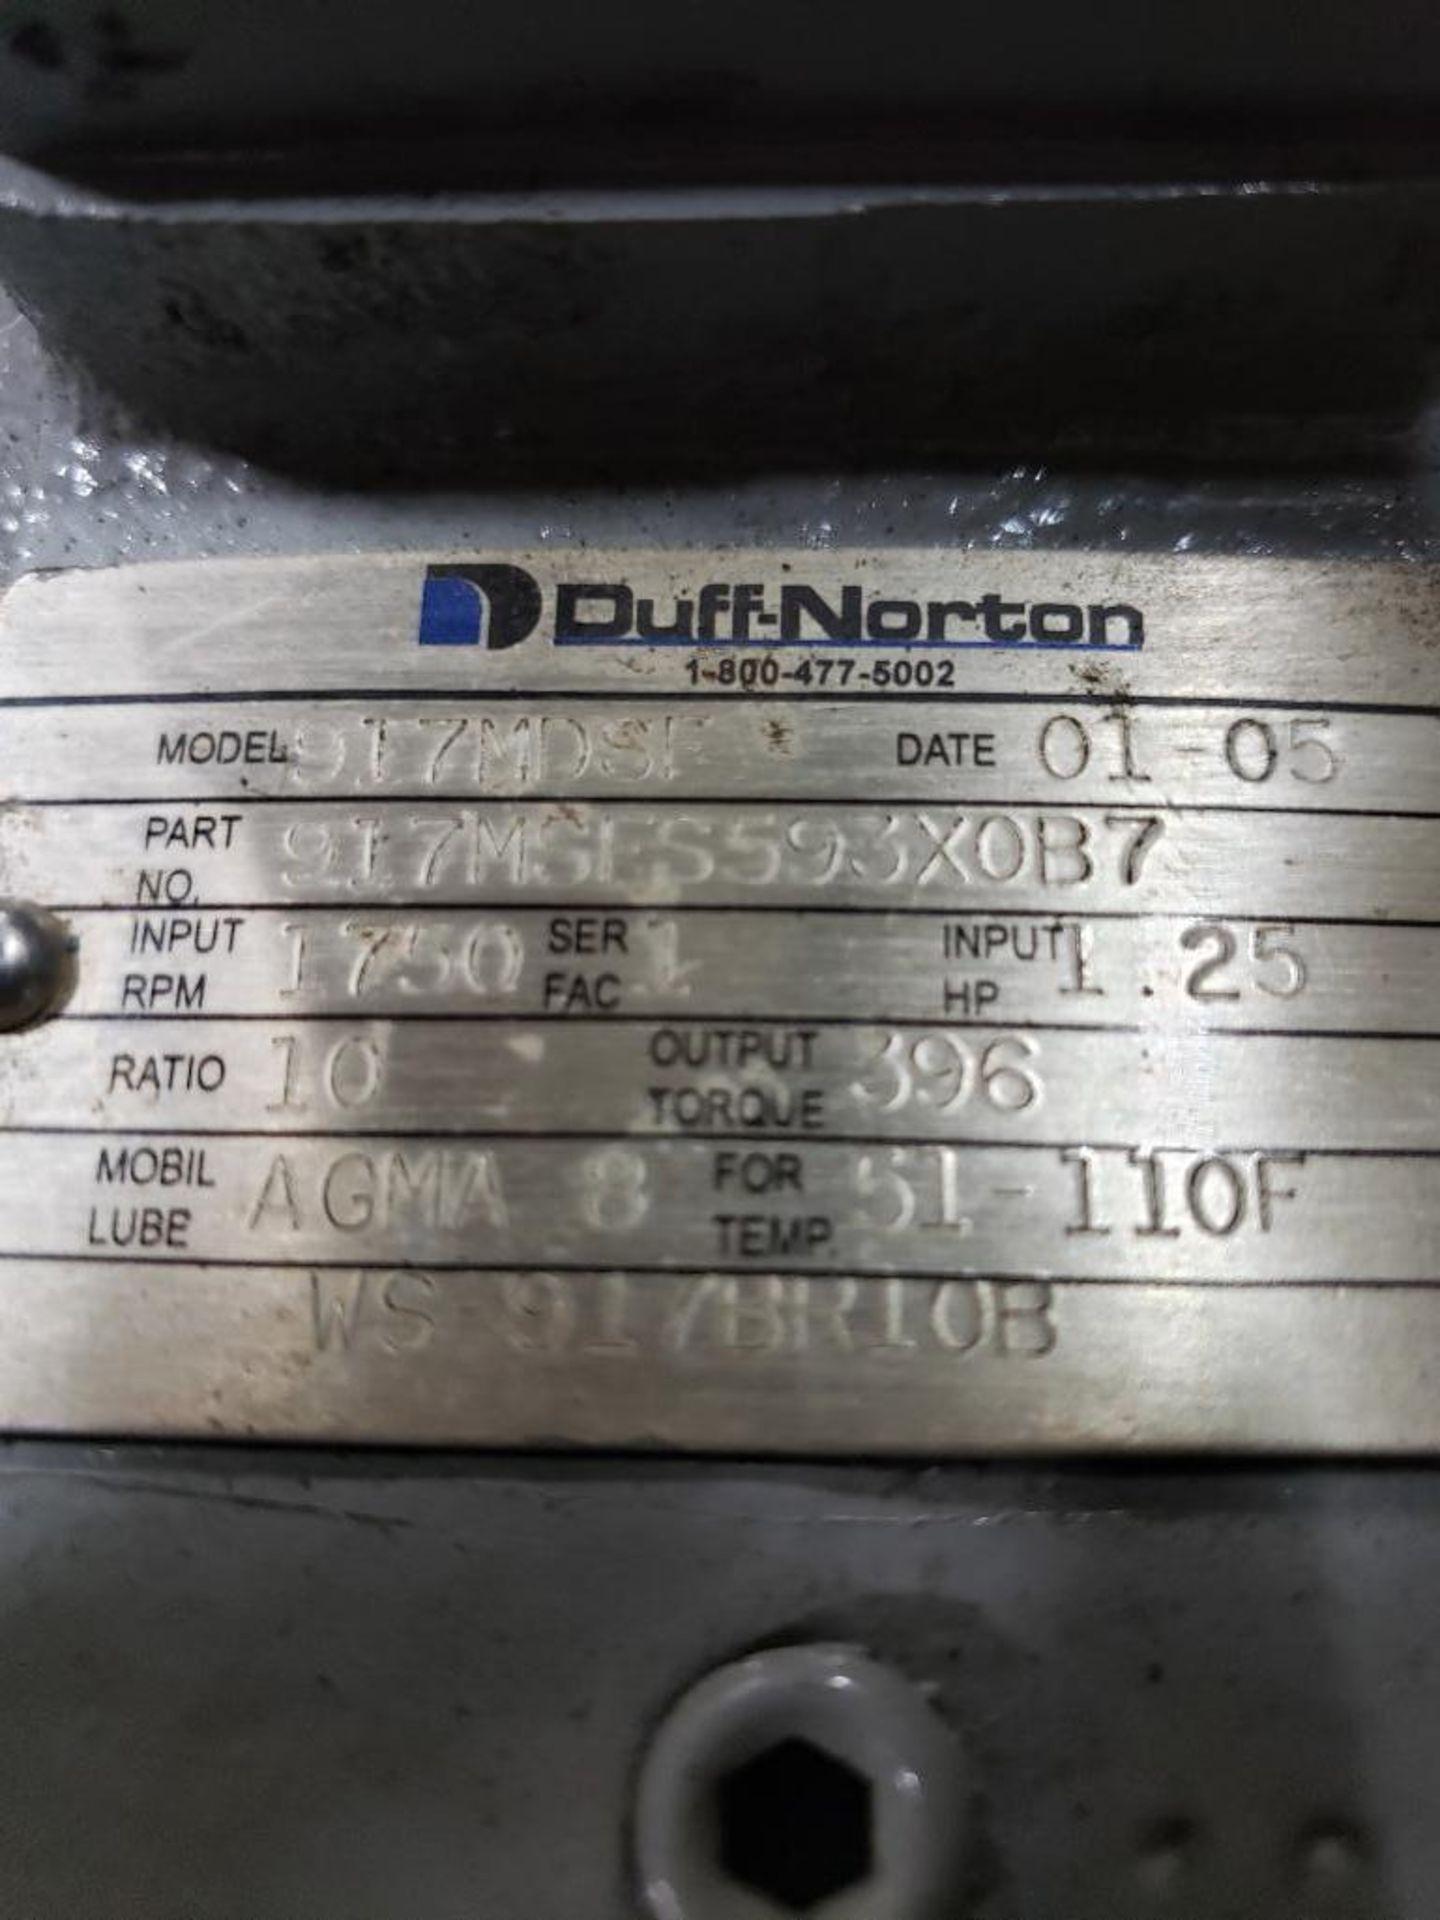 Lot 29 - Duff Norton anti-backlash actuator, model M10410-327.